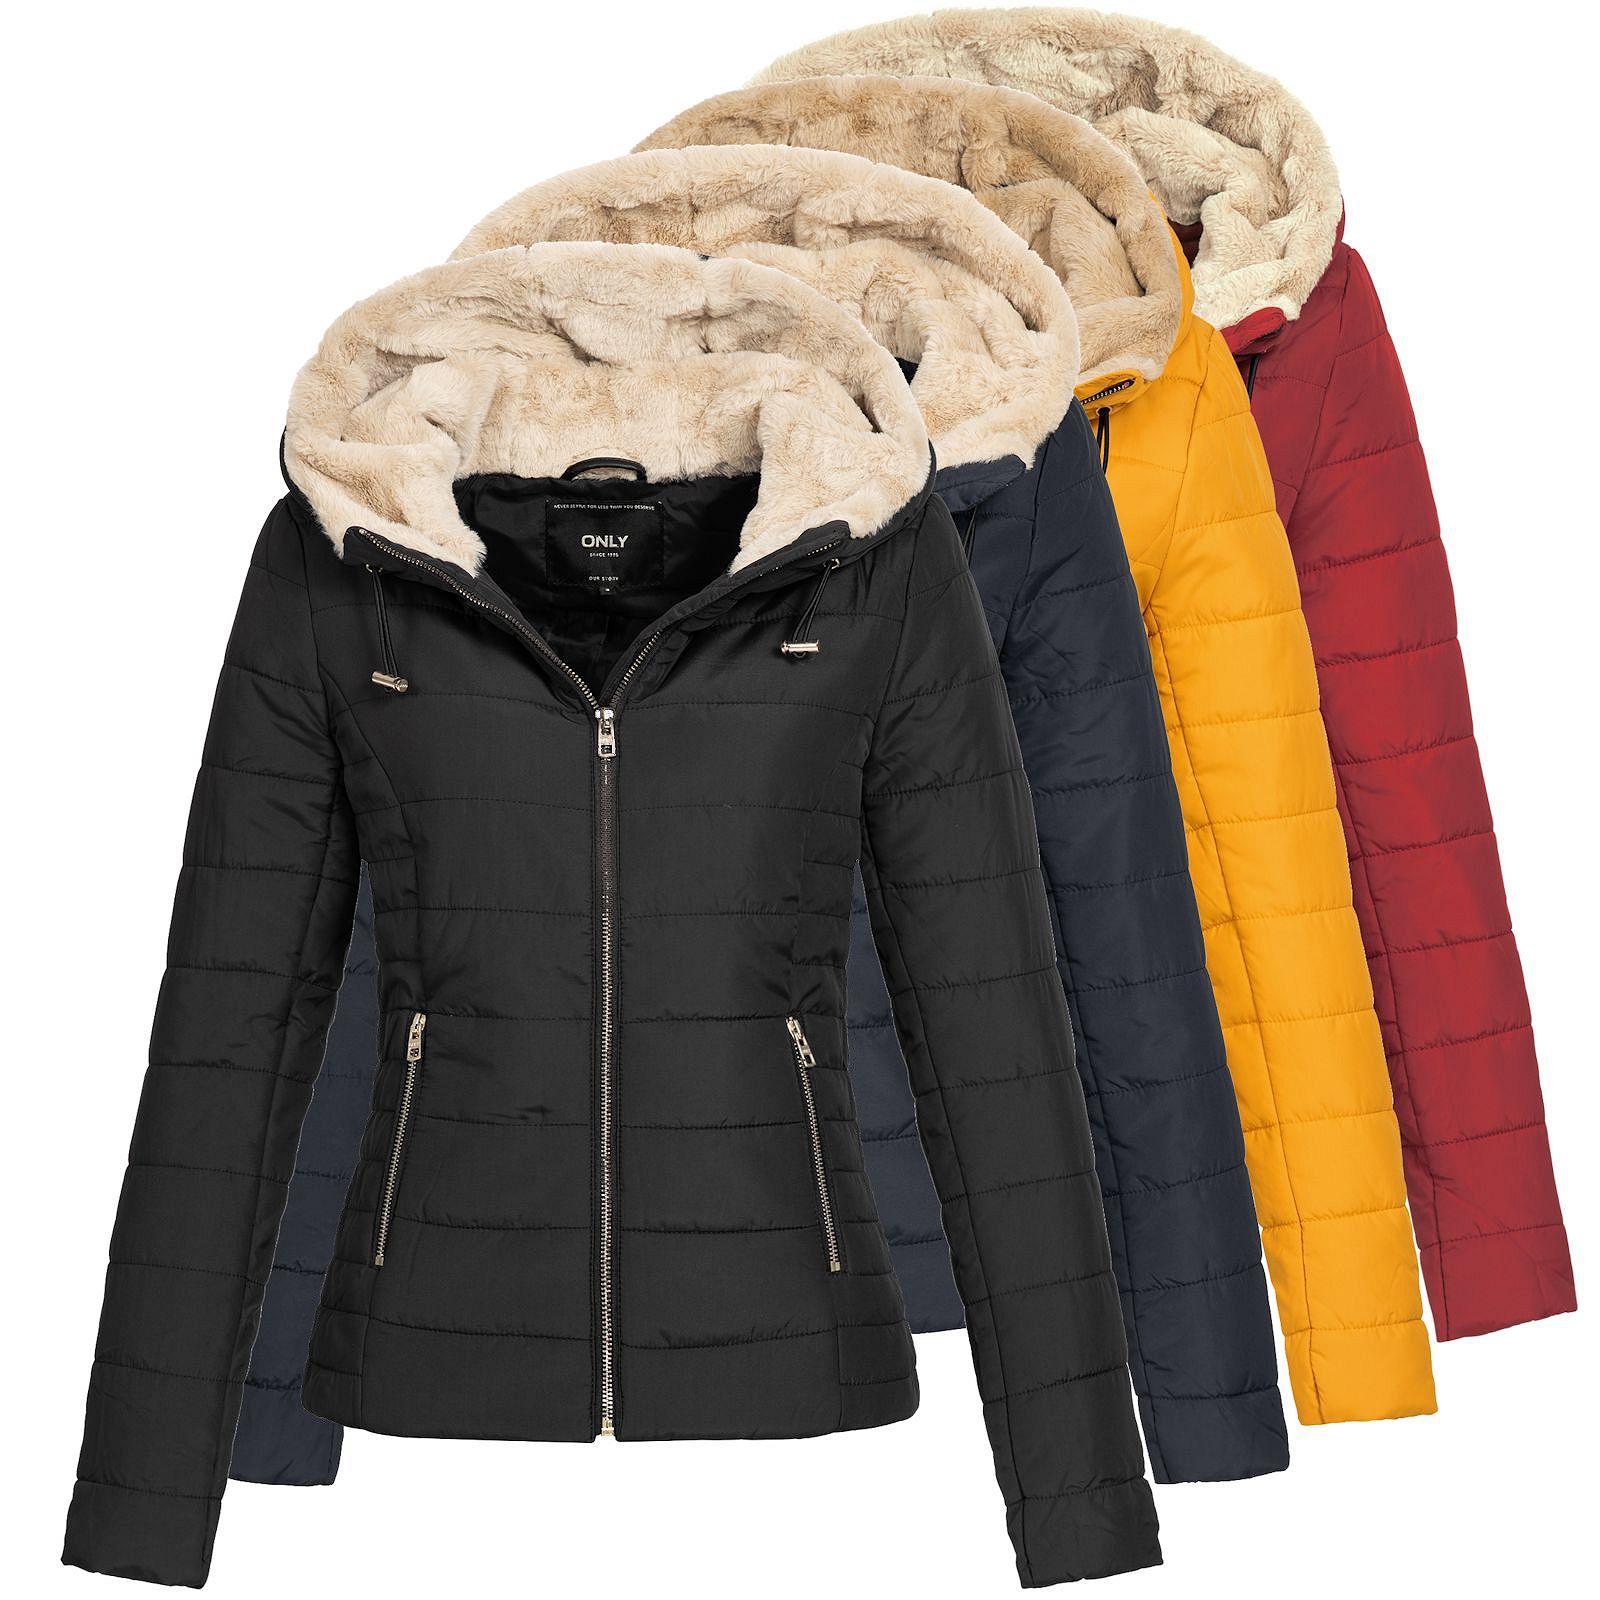 premium selection bab80 833db Details zu Only Damen Steppjacke Jacke Winterjacke Damenjacke  Übergangsjacke Shelly